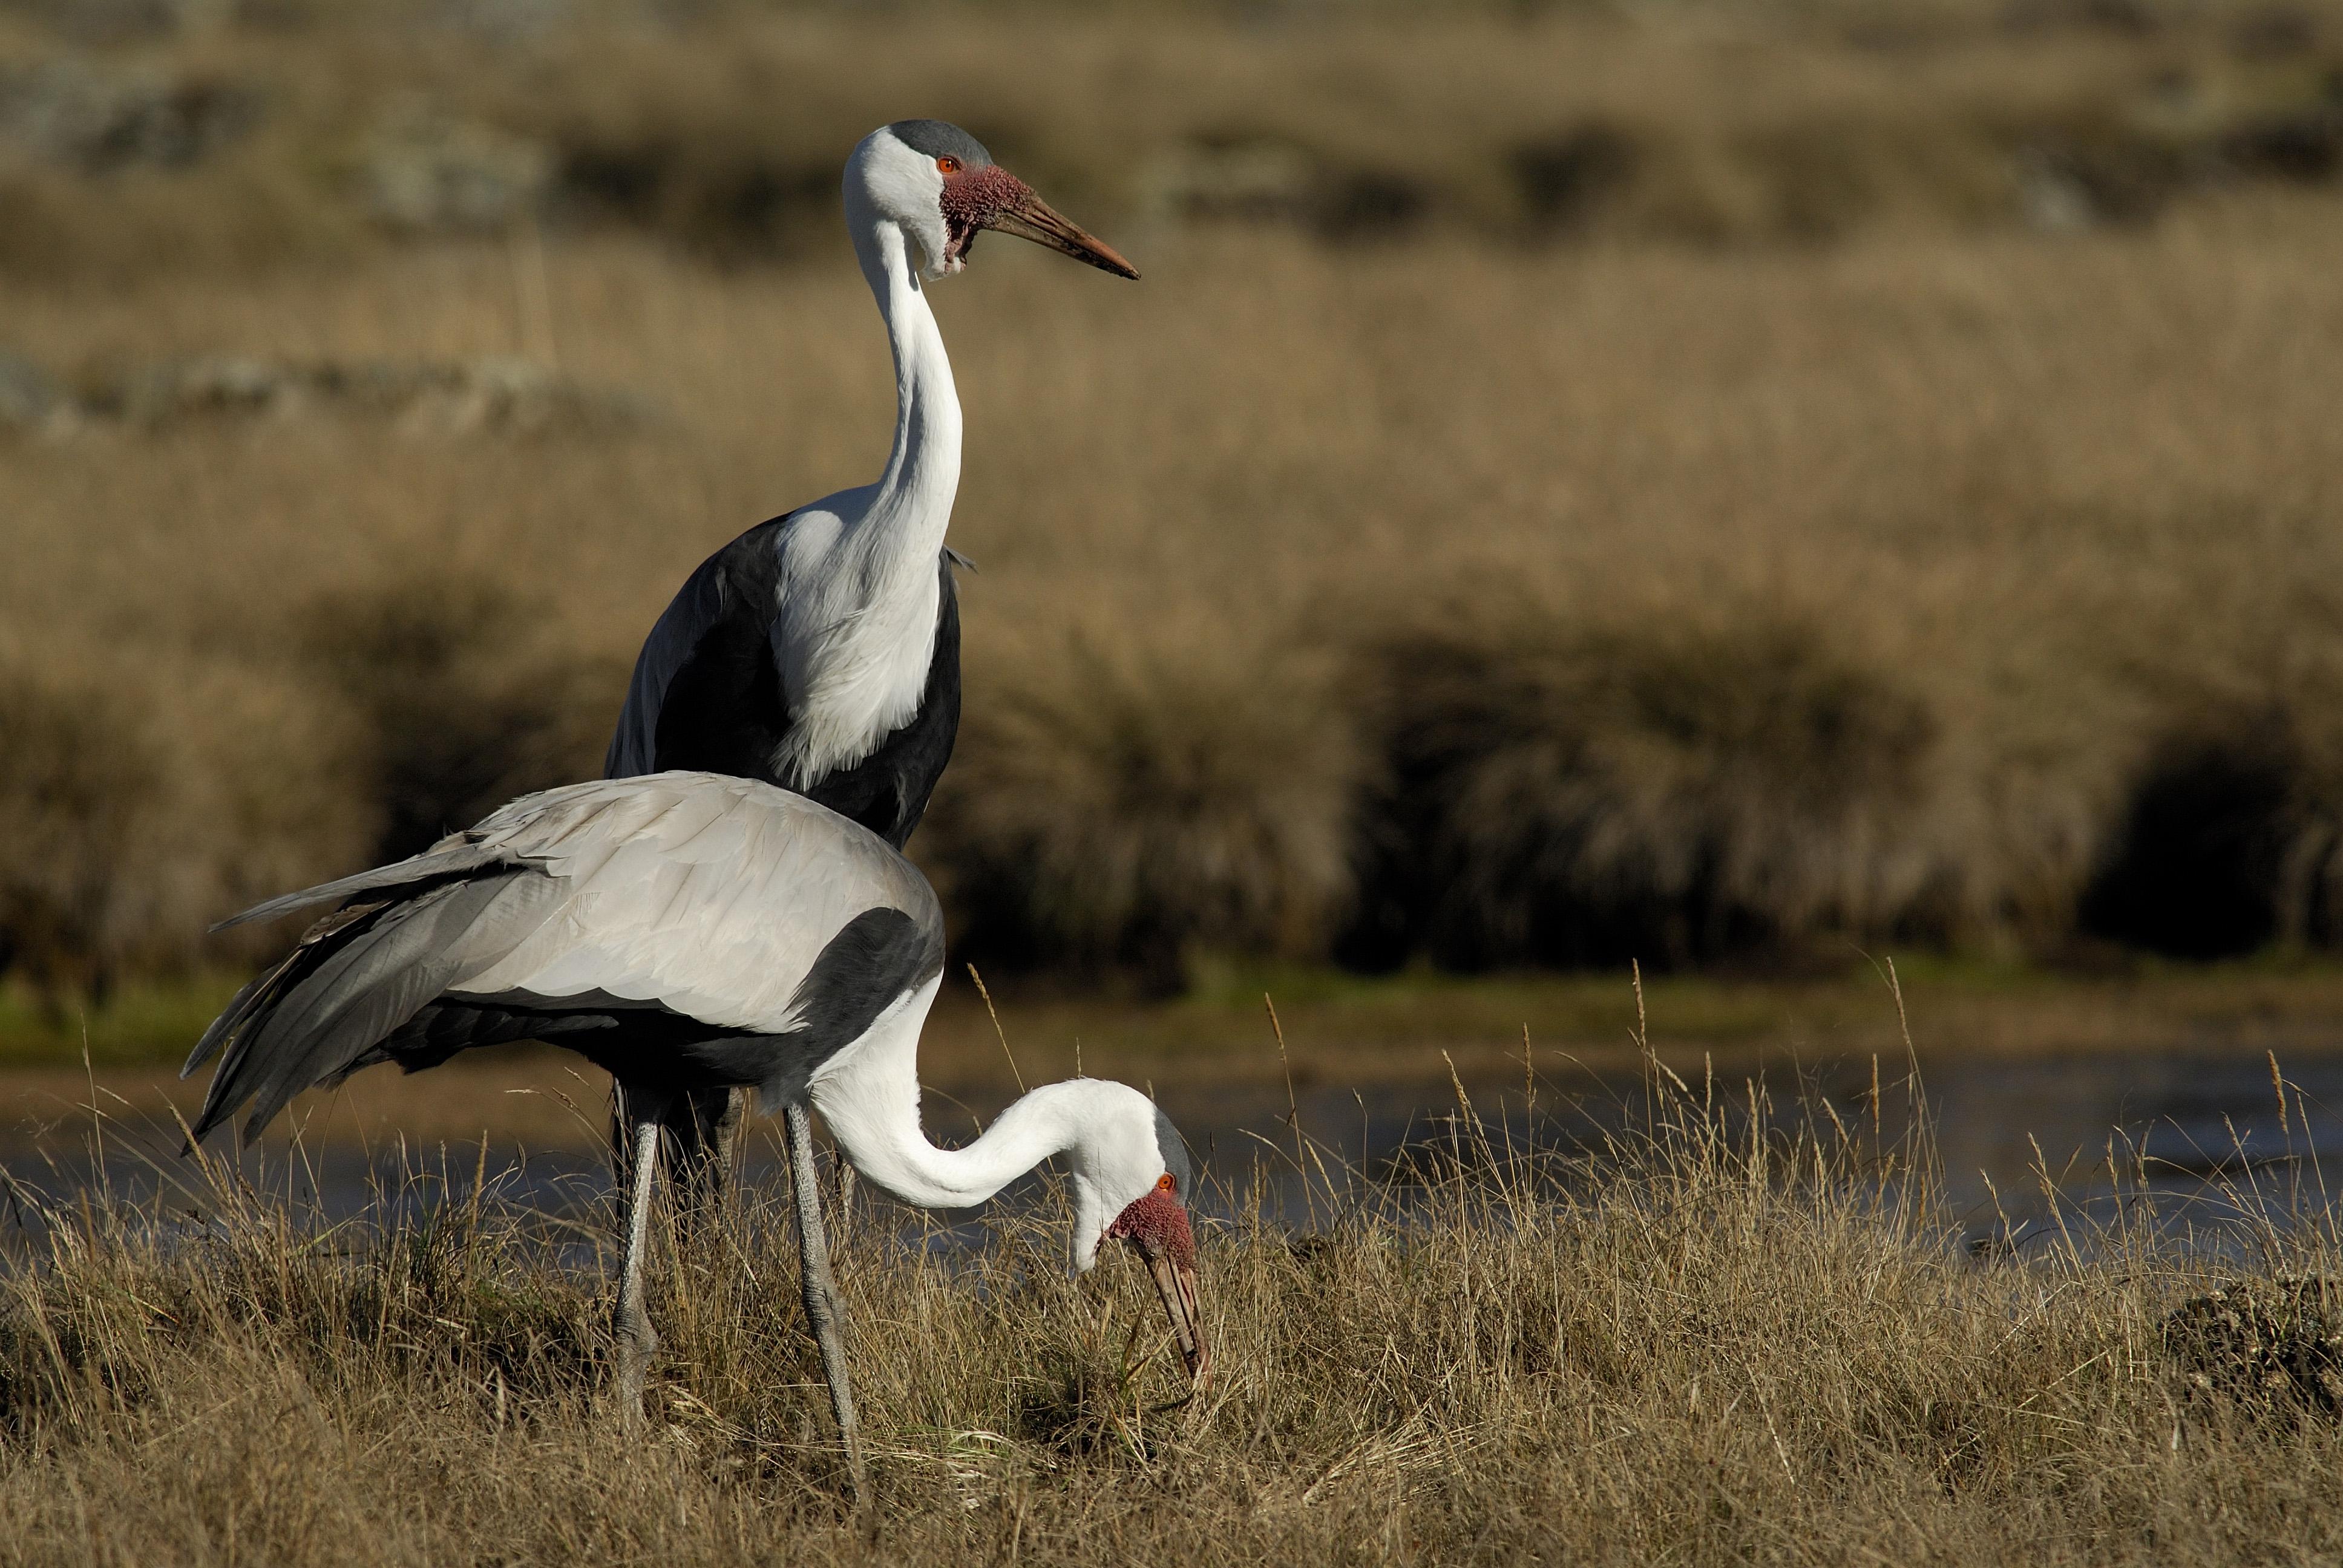 Wattled Crane. Photo by Delphin Ruche.